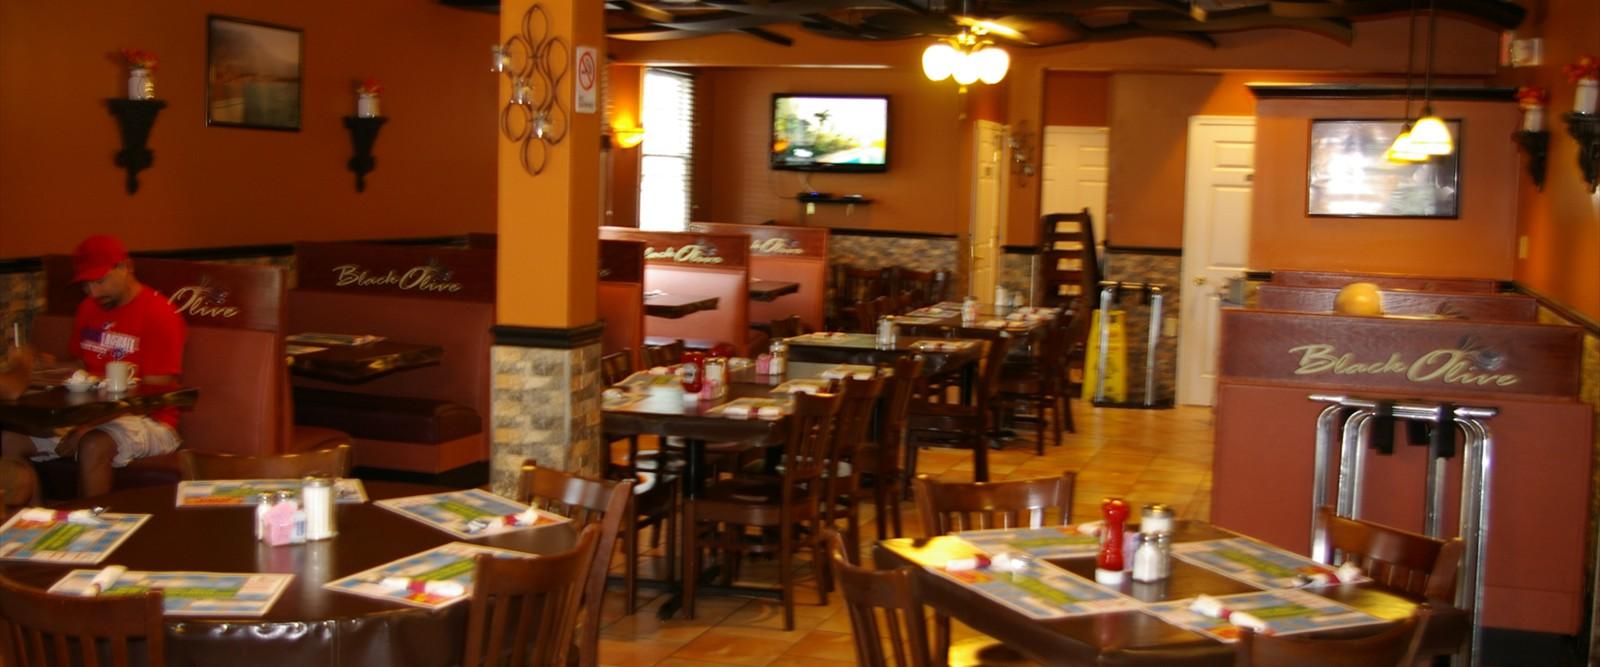 Black Olive Restaurant & Pizzeria